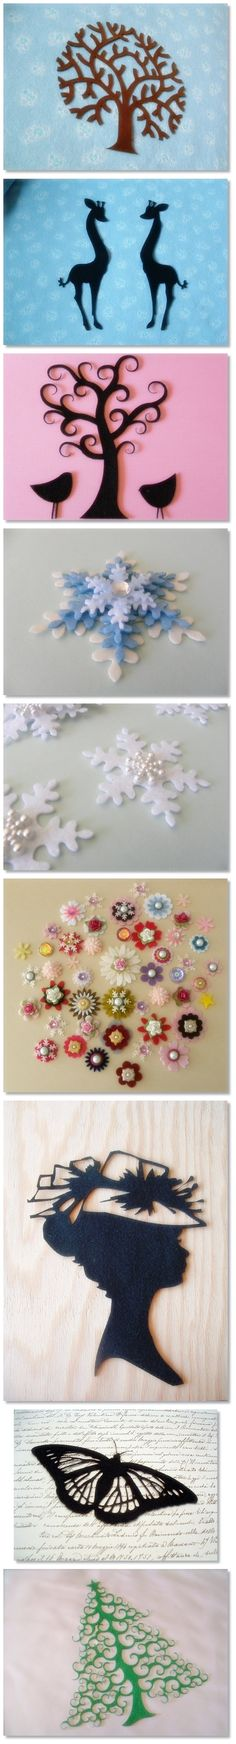 Felt Cutting Art - Includes Snowflakes / Flowers    (03.05.15)